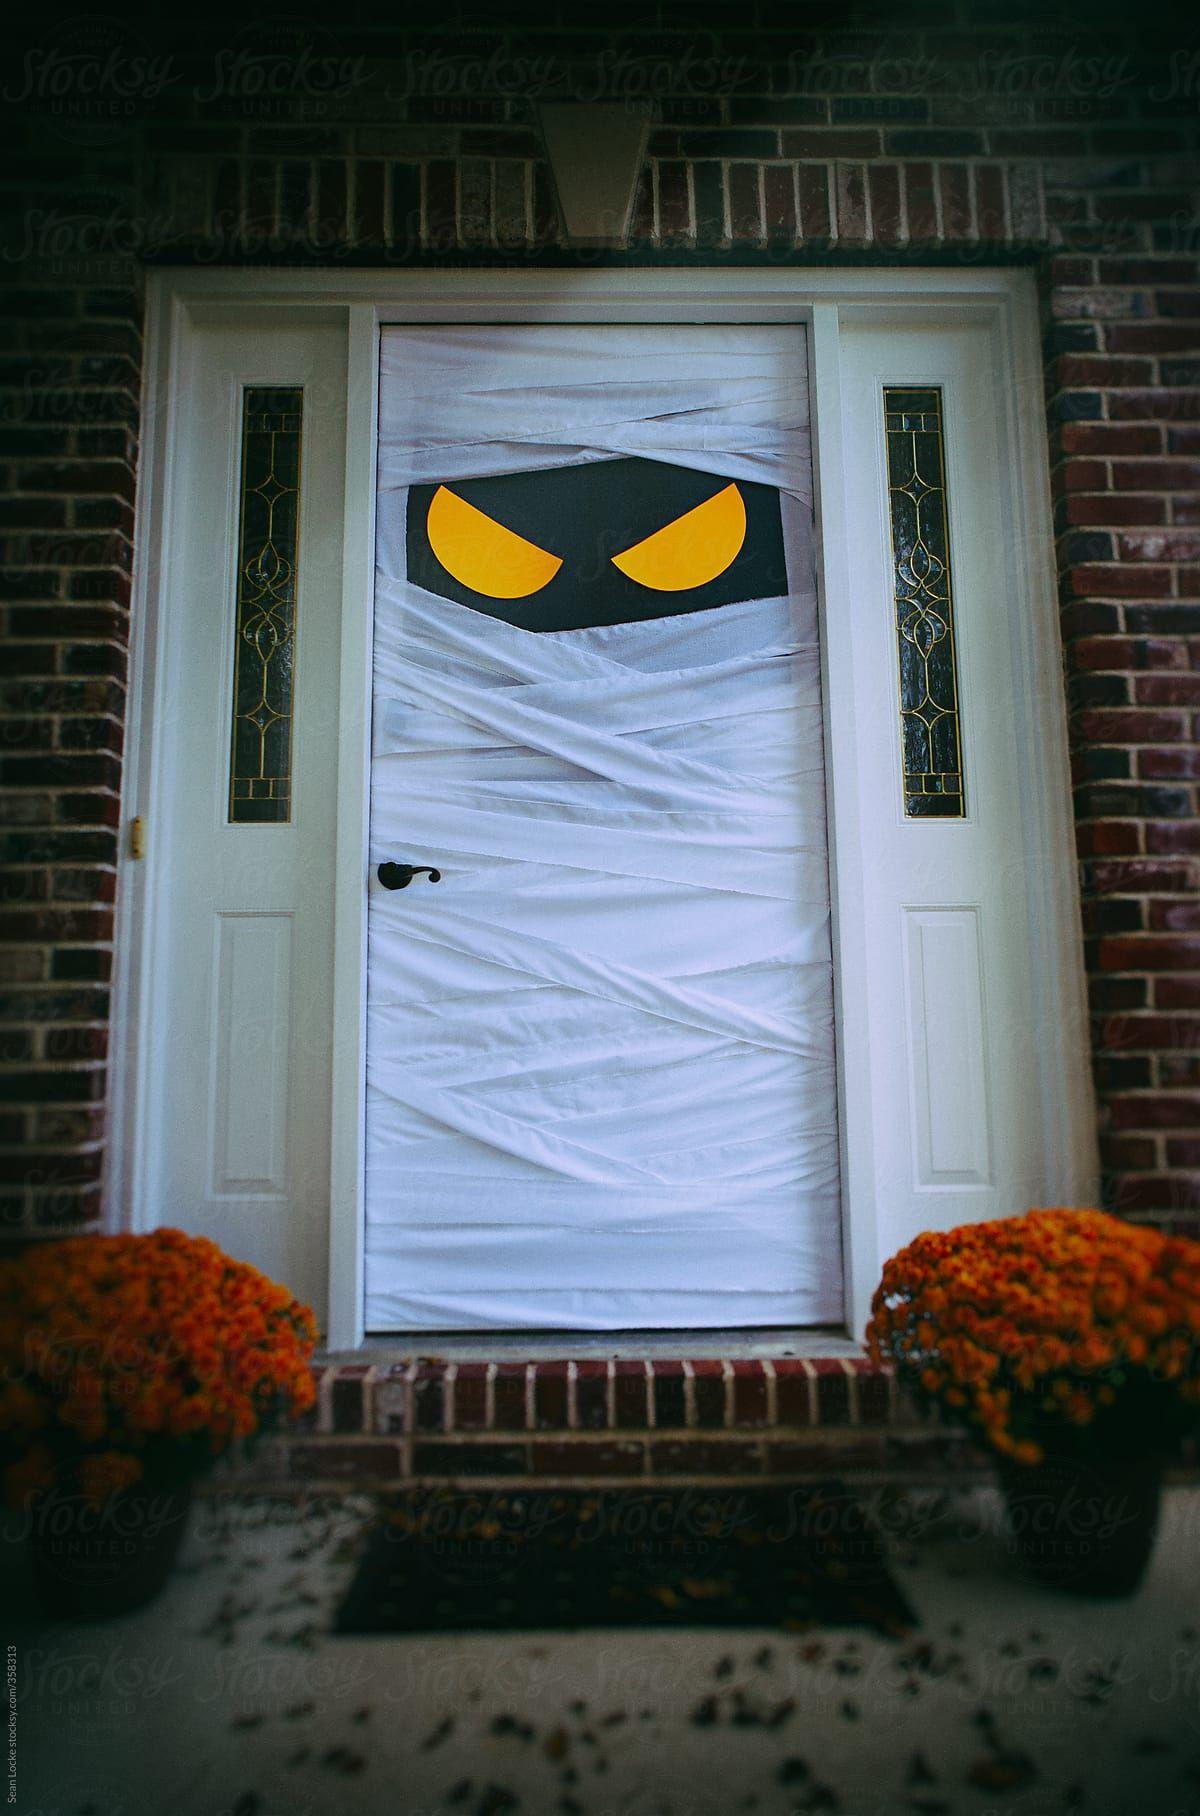 Spooky Halloween Door Dressed As Mummy Stocksy United Halloween Door Decorations Halloween Outdoor Decorations Scary Halloween Decorations